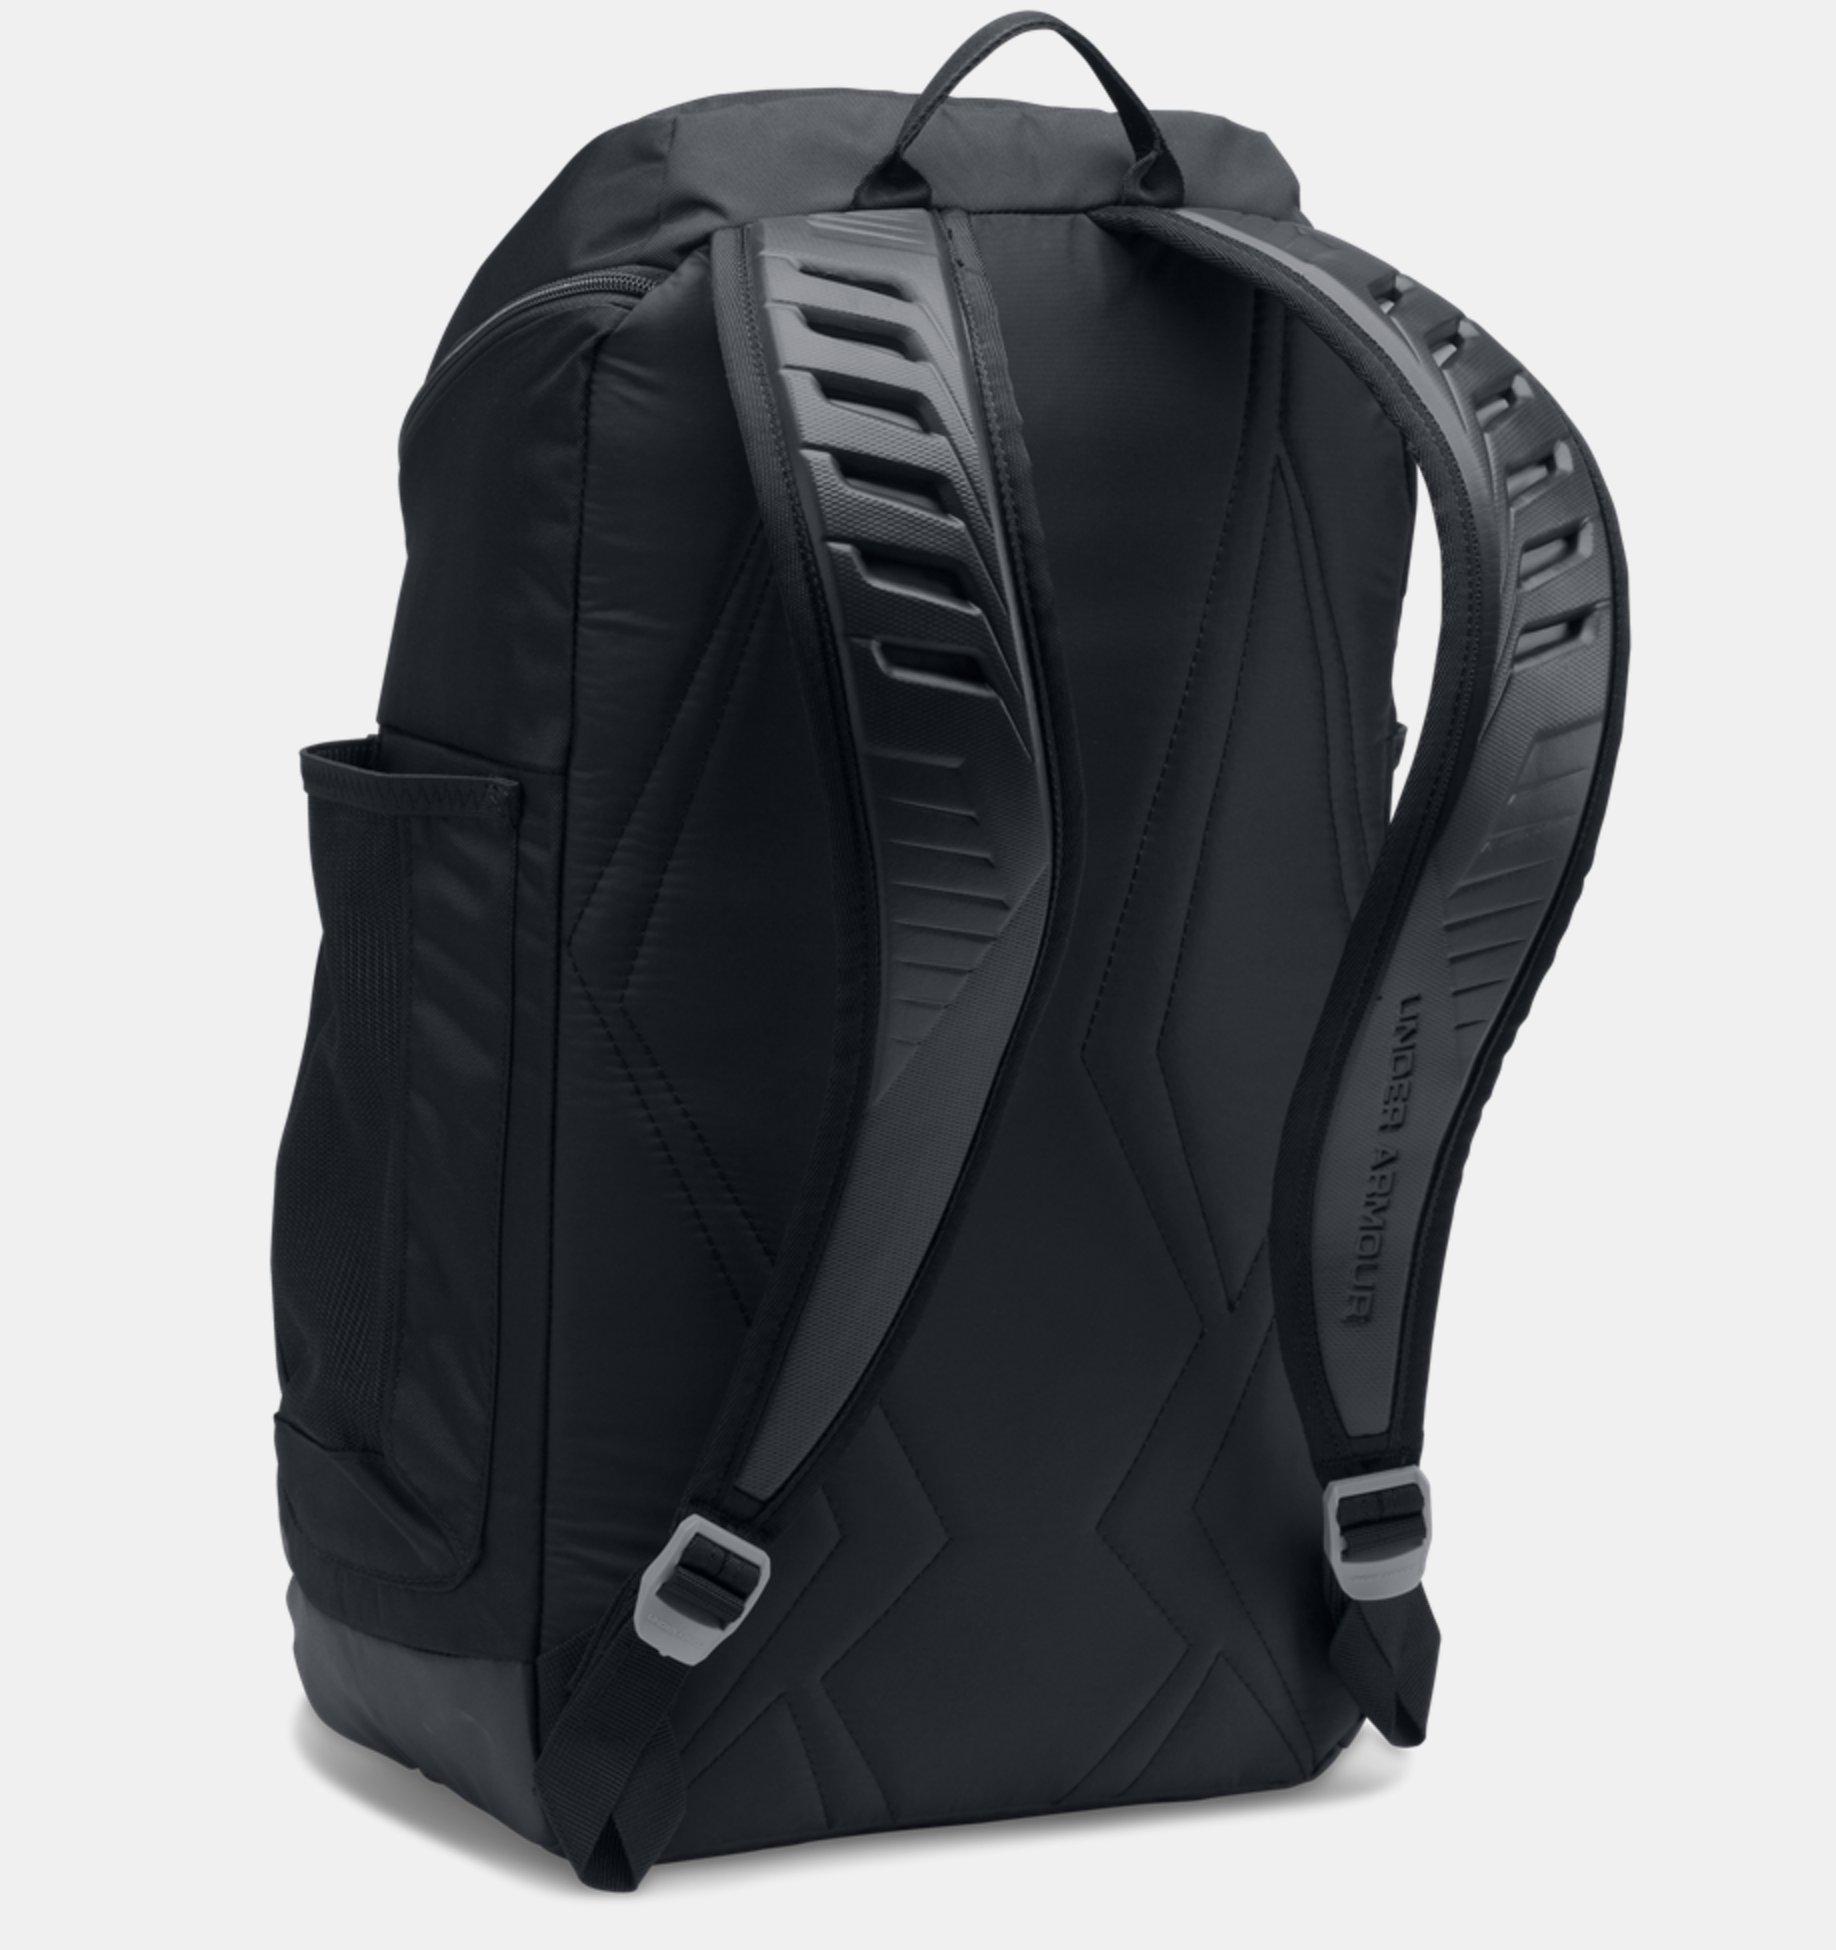 UA Undeniable 3.0 Backpack  UA Undeniable 3.0 Backpack 432963ba12a0a